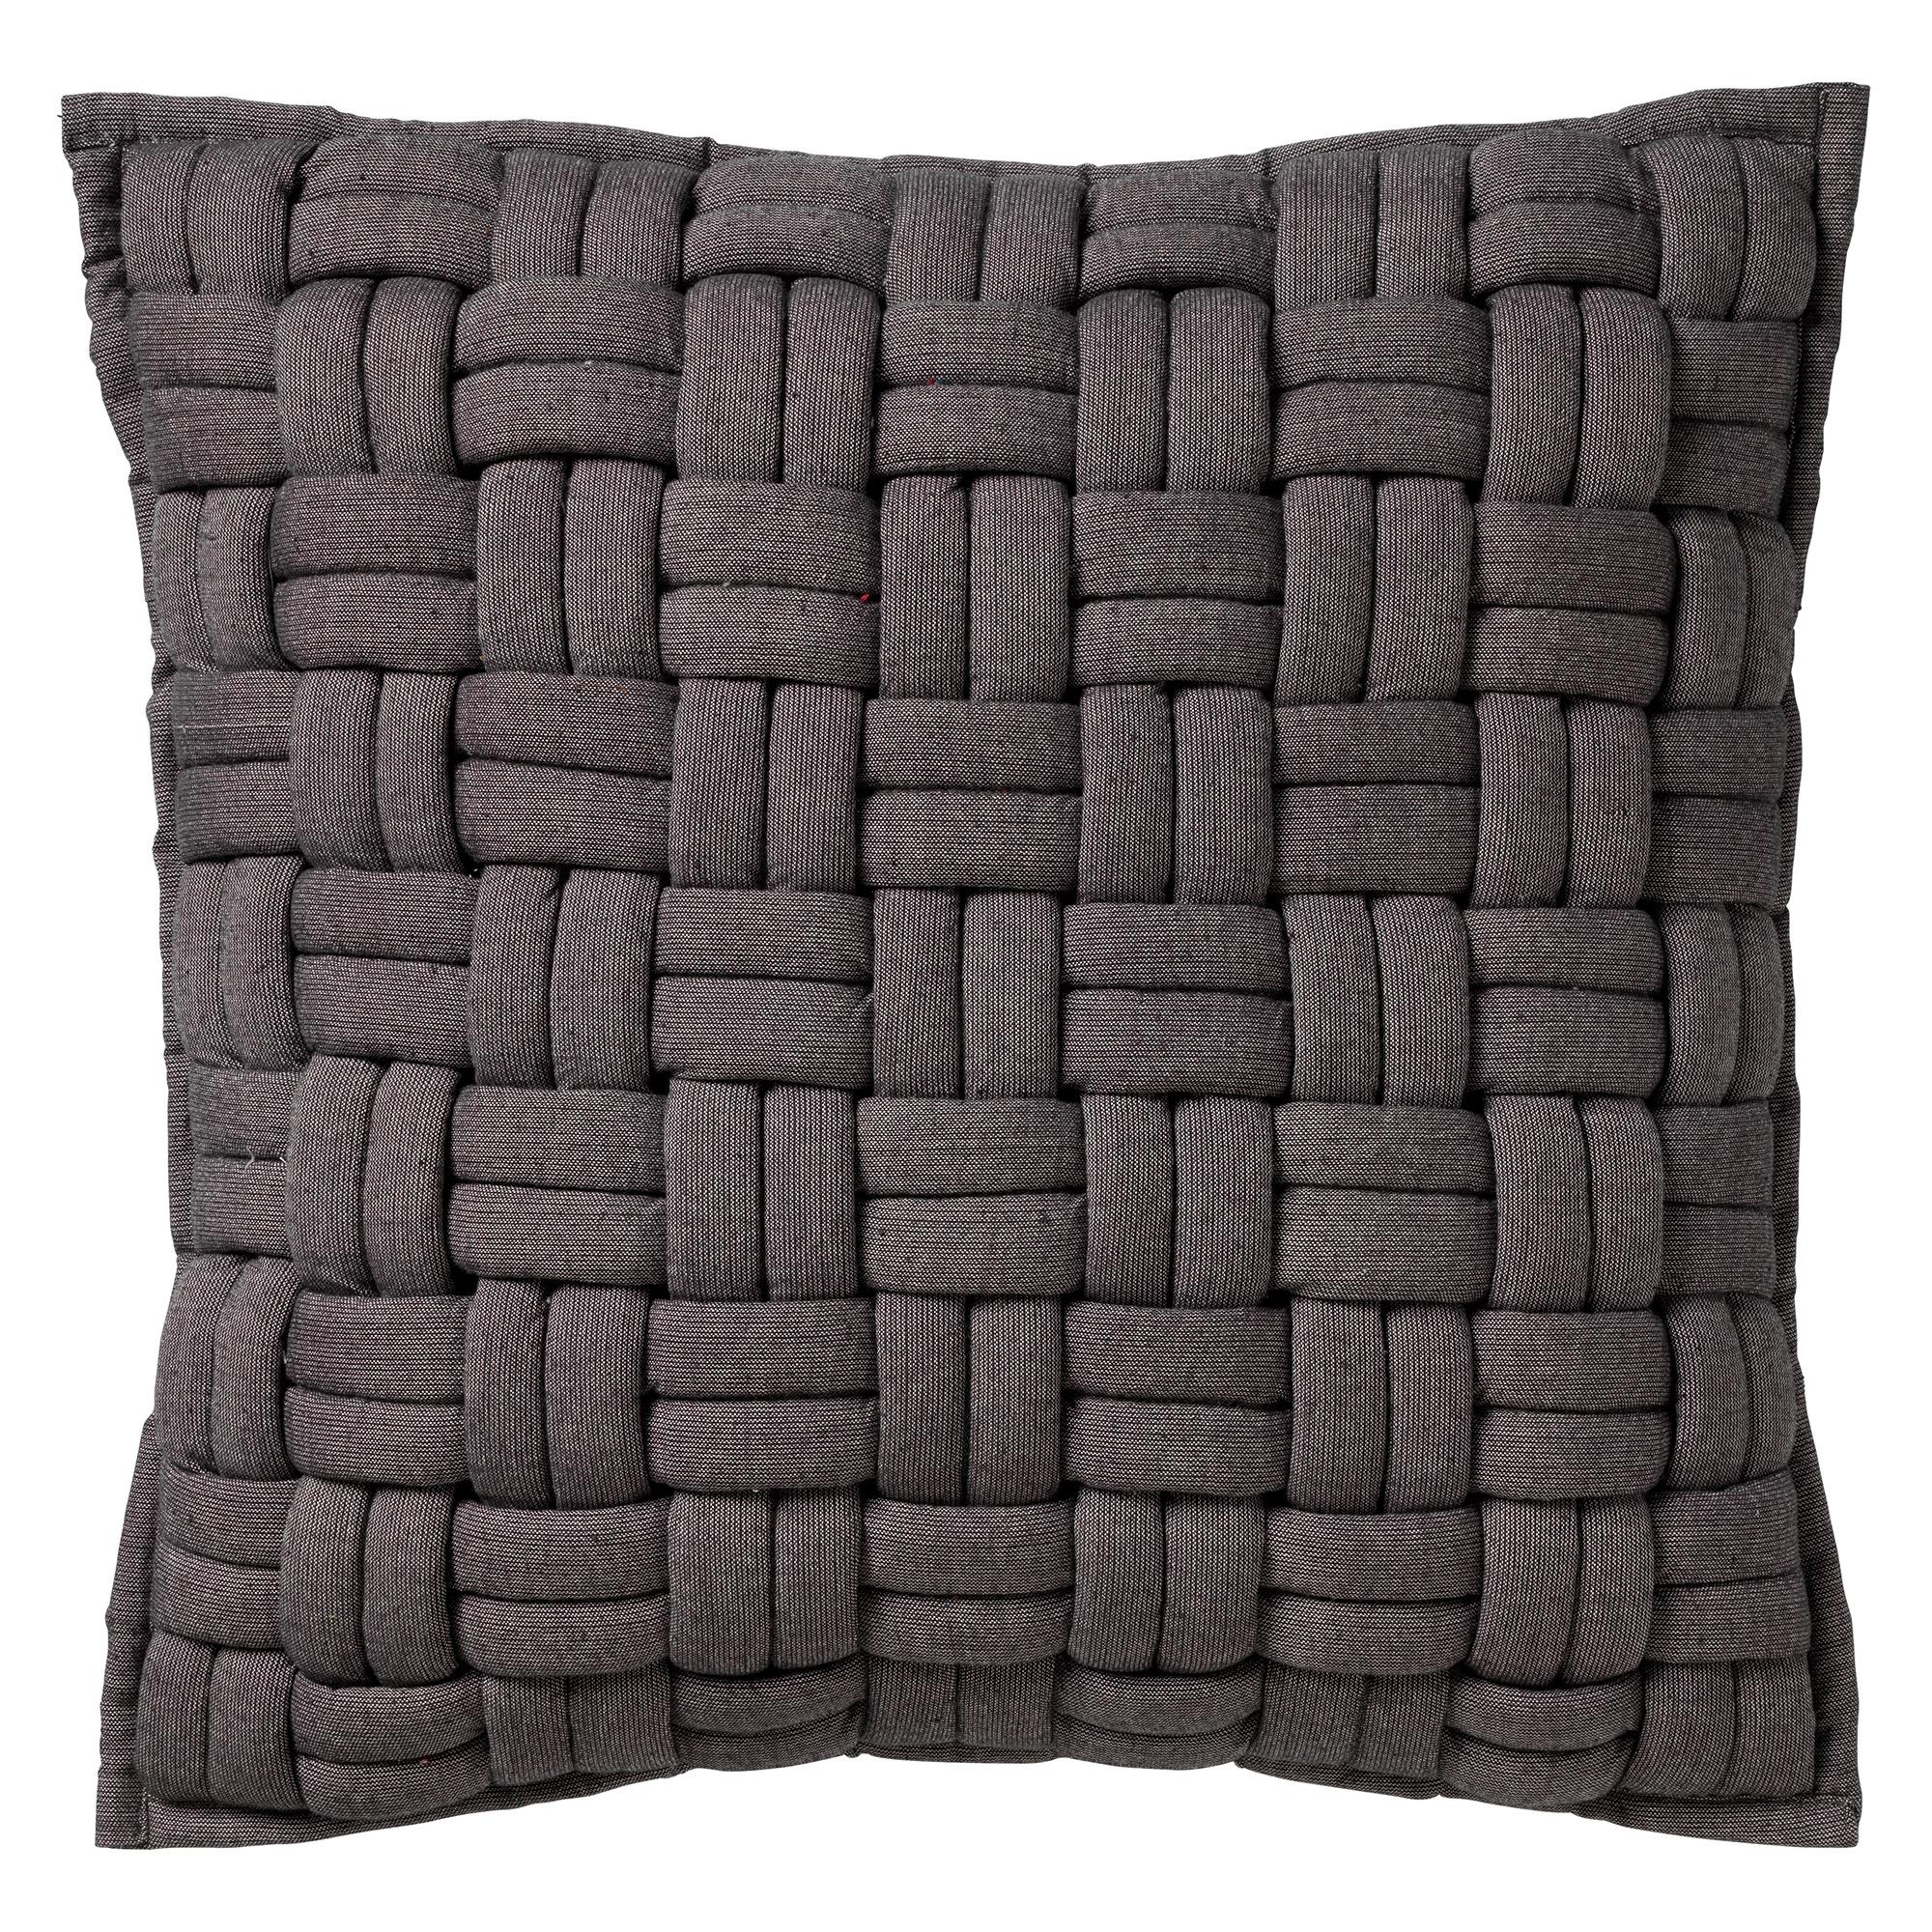 LEVI - Sierkussen Charcoal Grey 45x45 cm